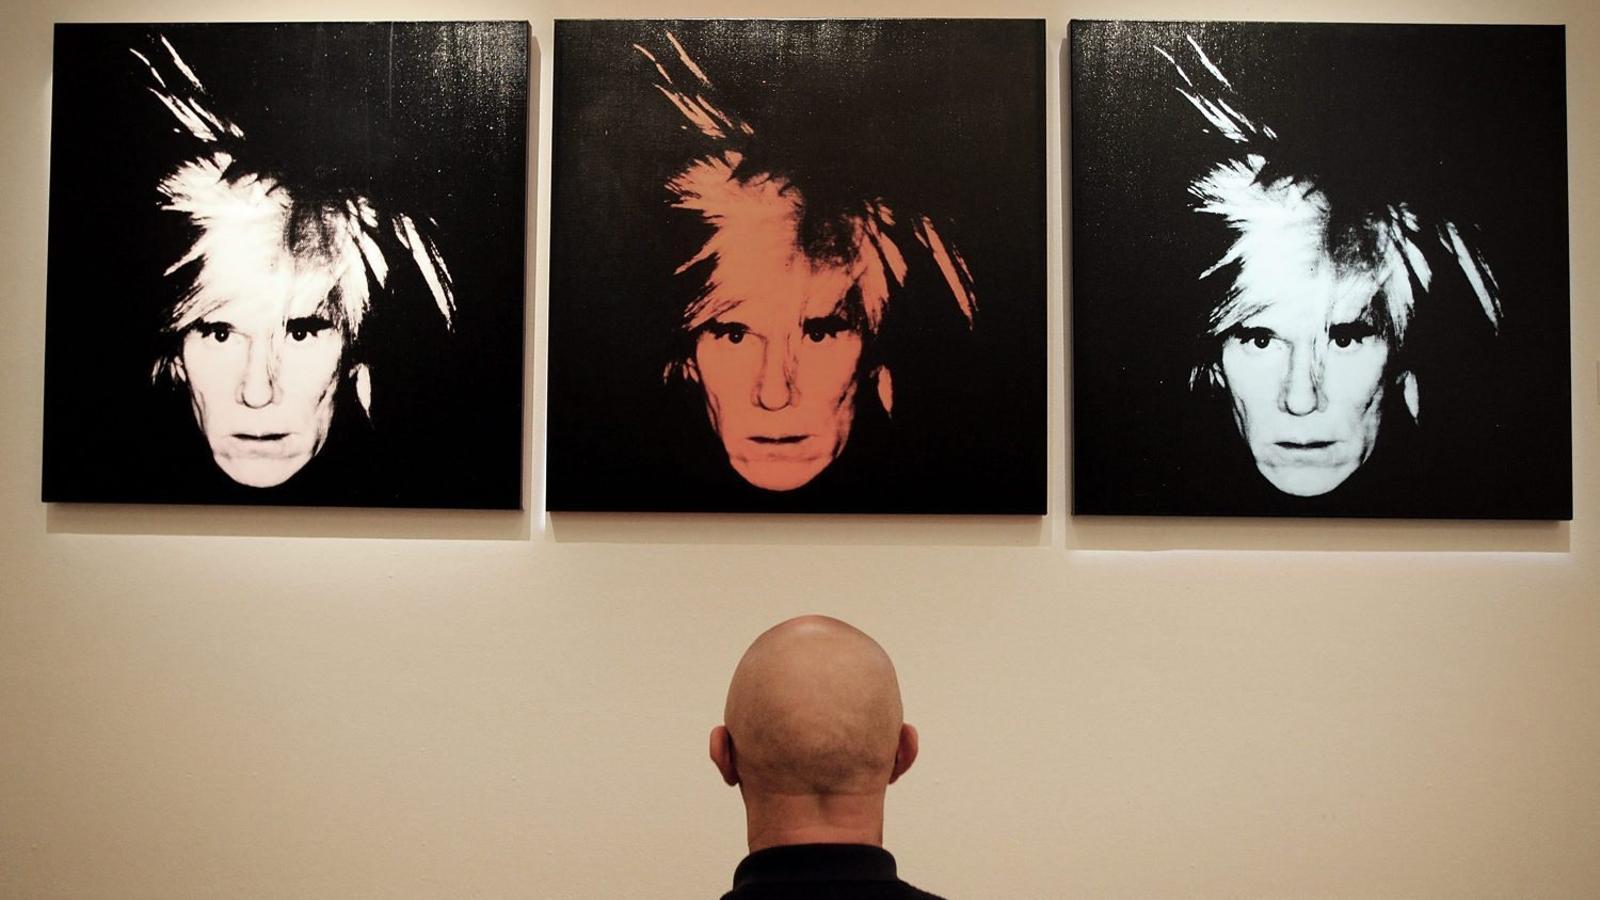 Andy Warhol: 30 anys de glòria